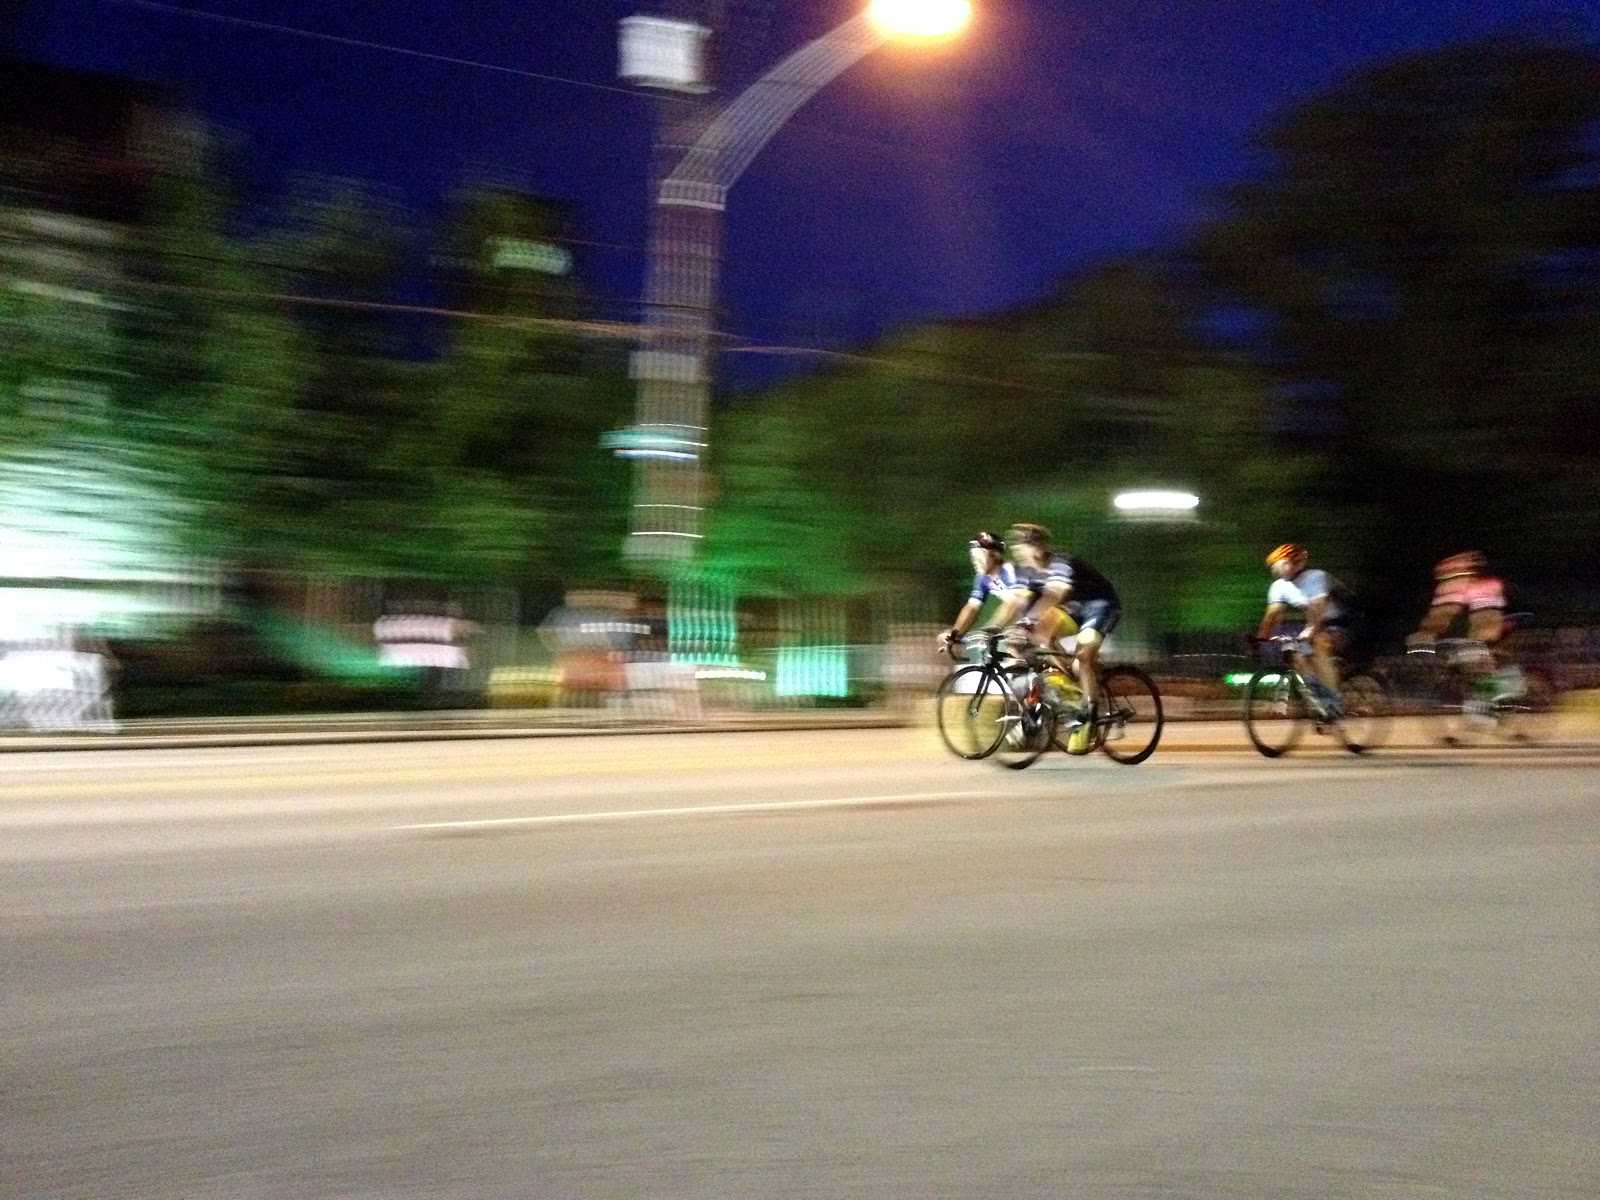 cozy birdhouse | cycling race